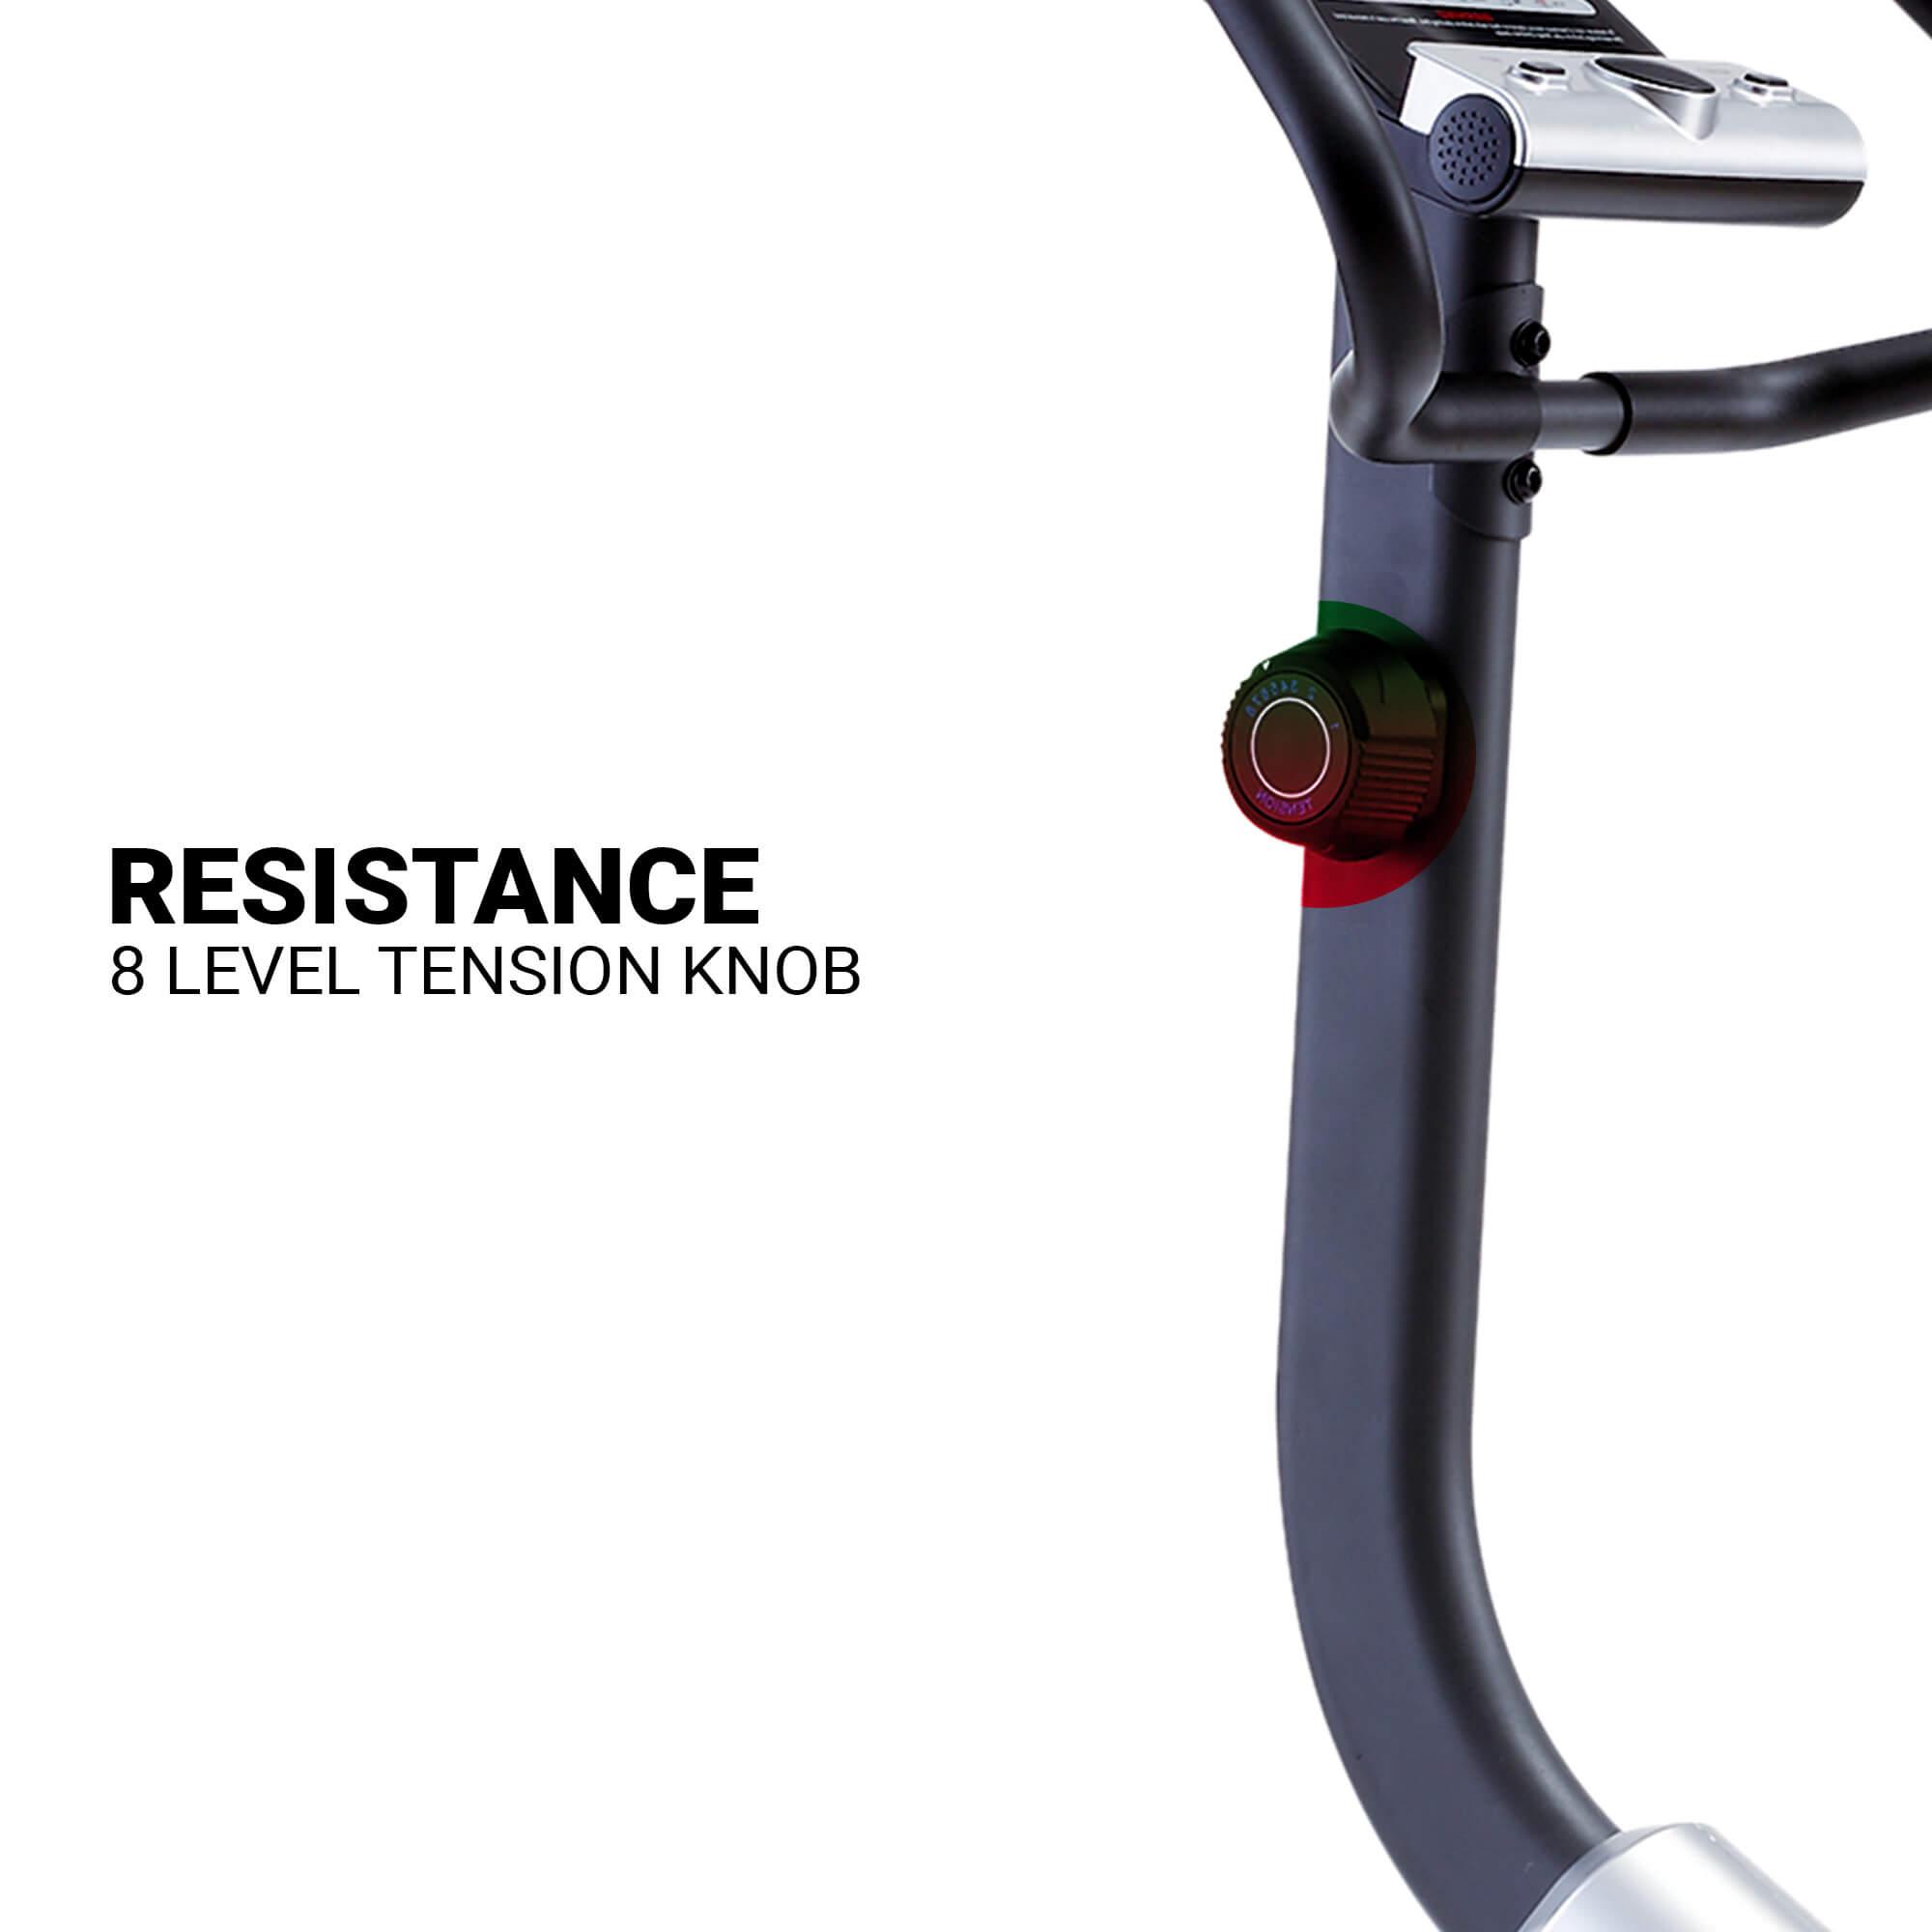 BU-700 Magnetic Upright Bike